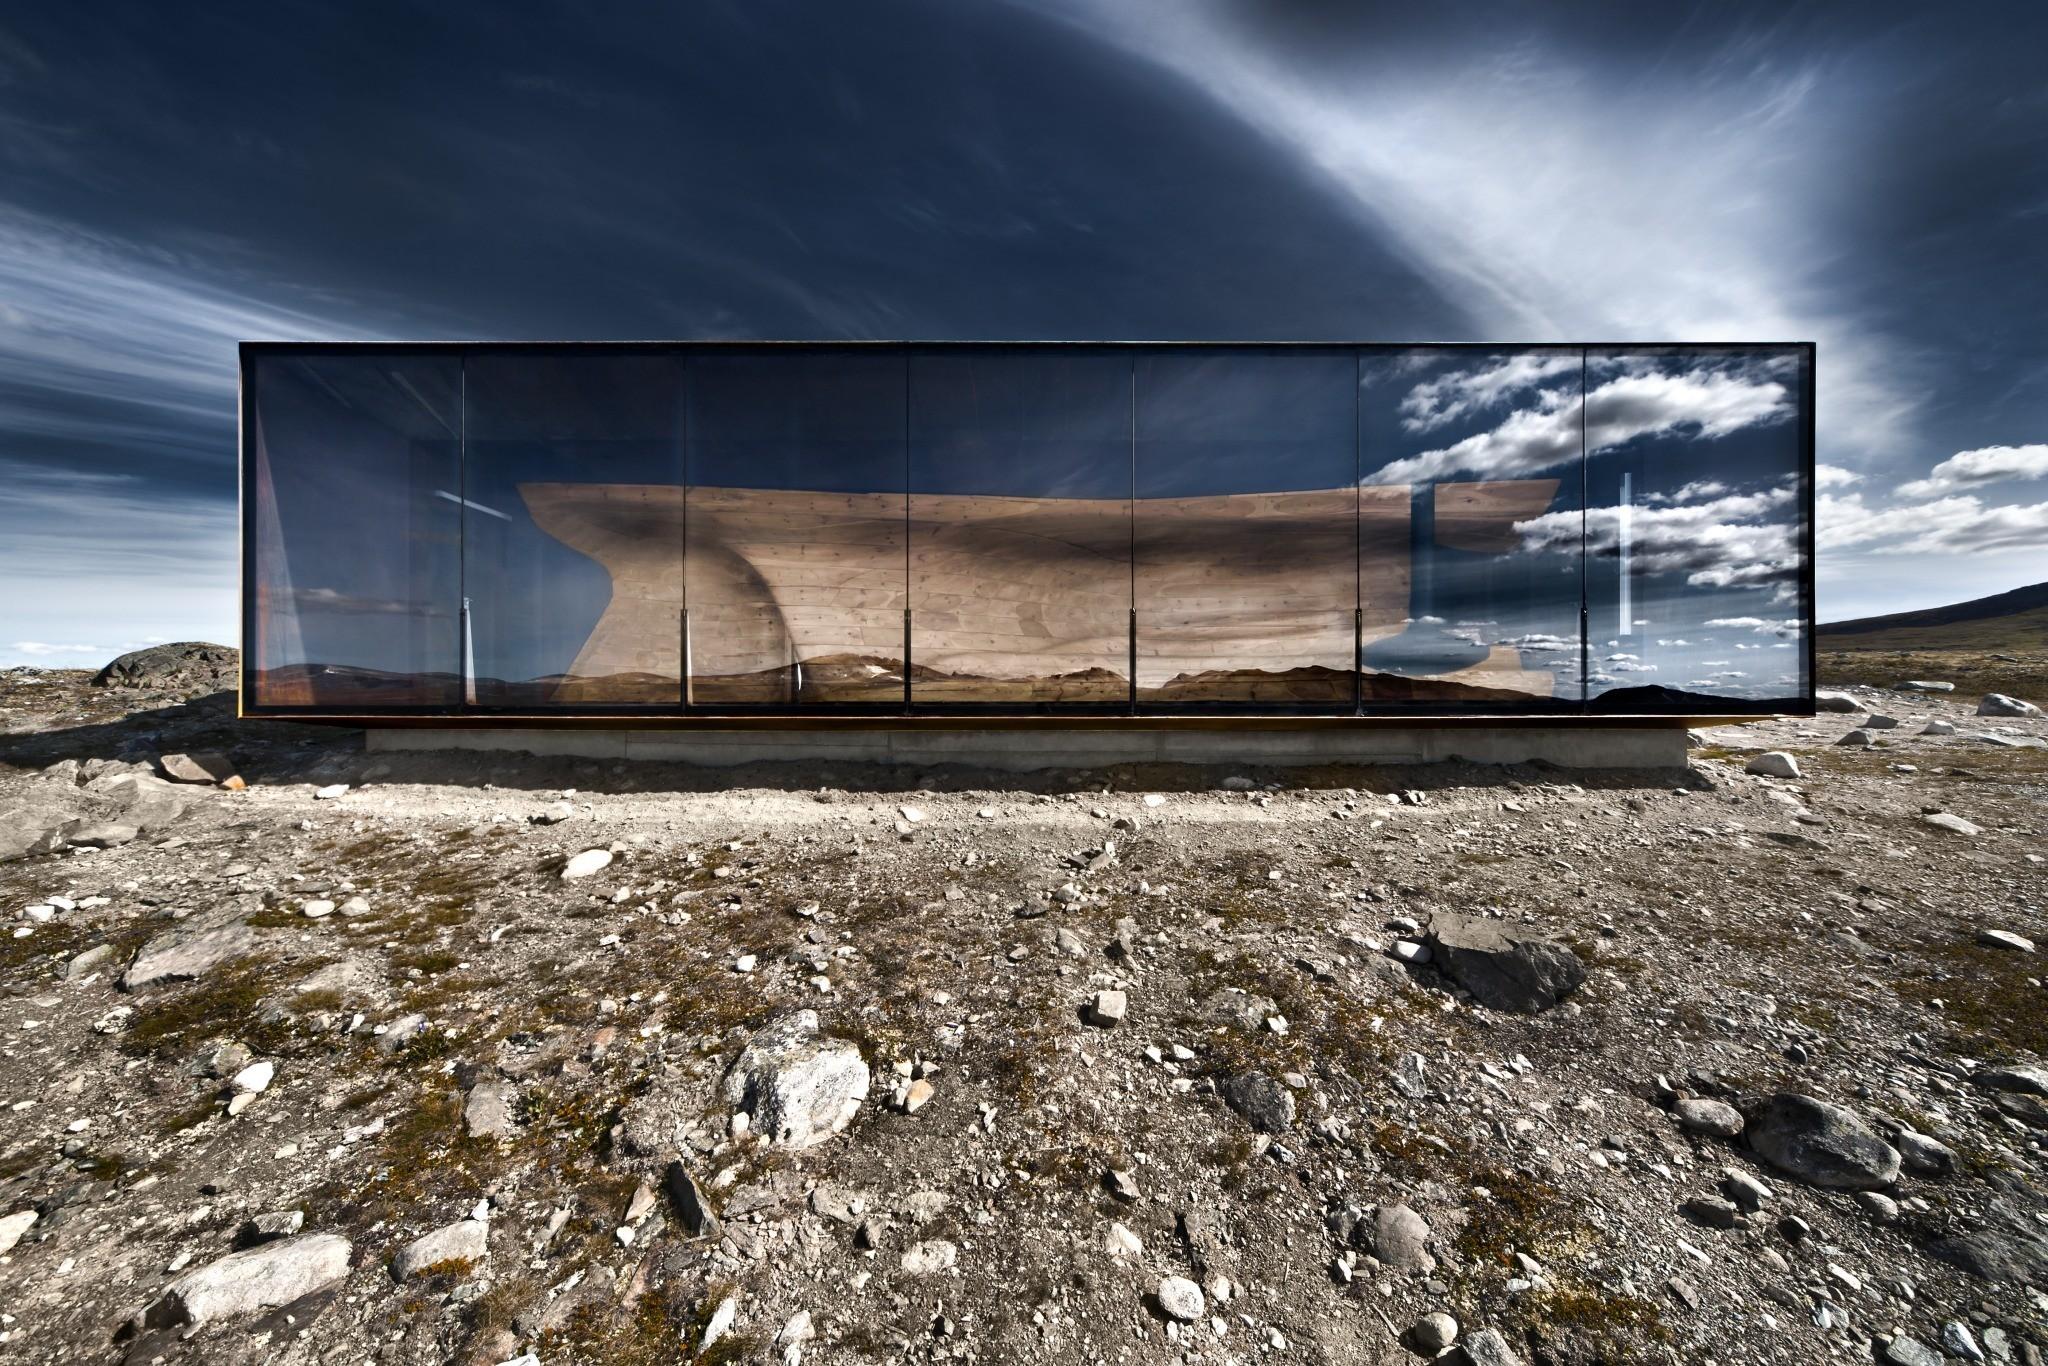 Snøhetta - A Norwegian Firm Defining The Design Scene